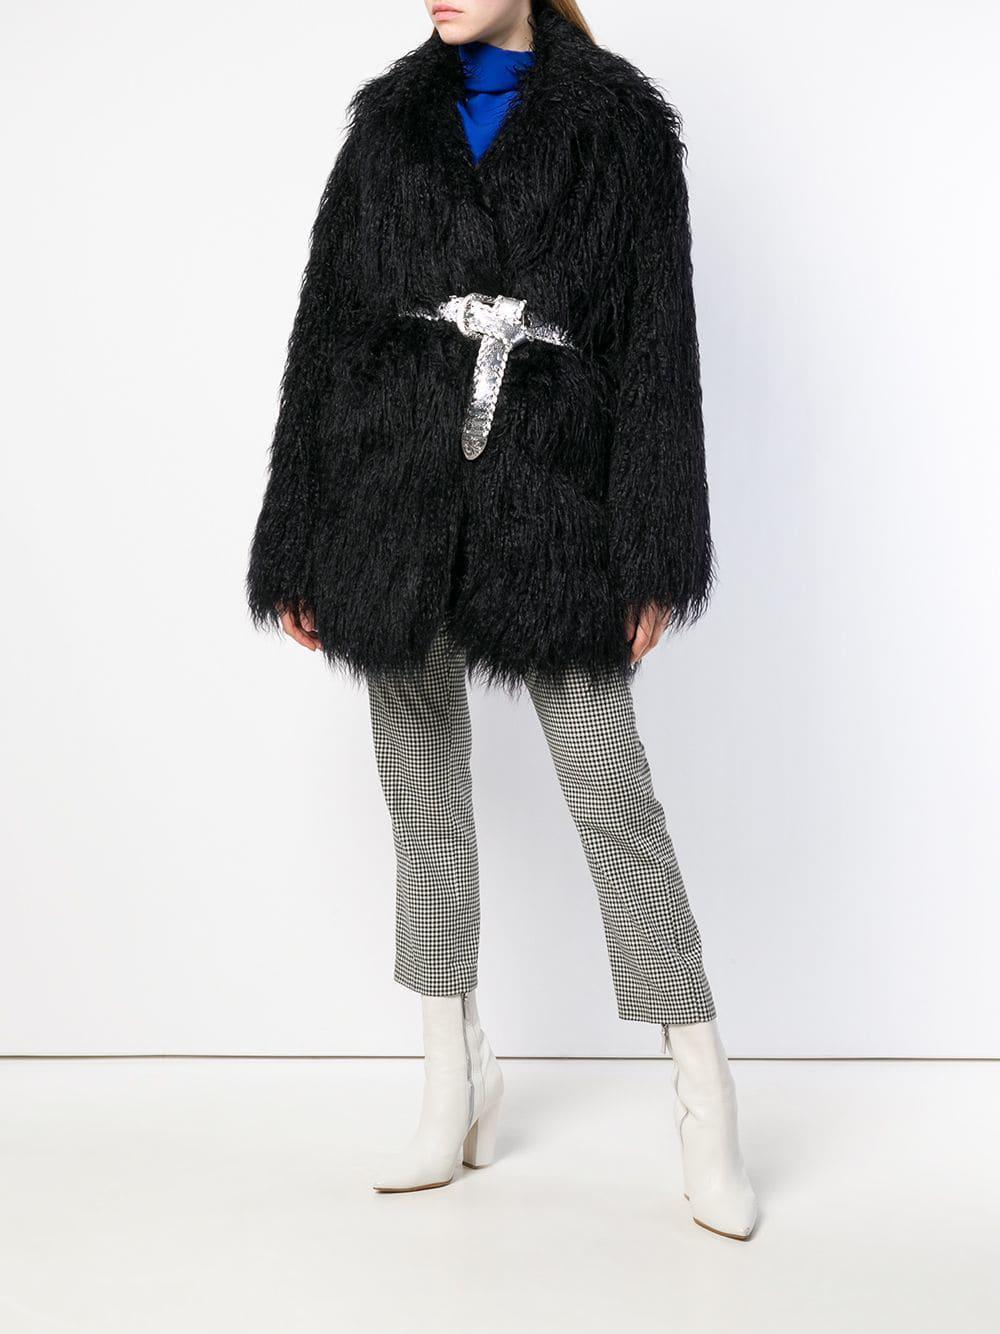 ... Martin Margiela - Black Faux Fur shaggy Coat - Lyst. View fullscreen 884326664cf31